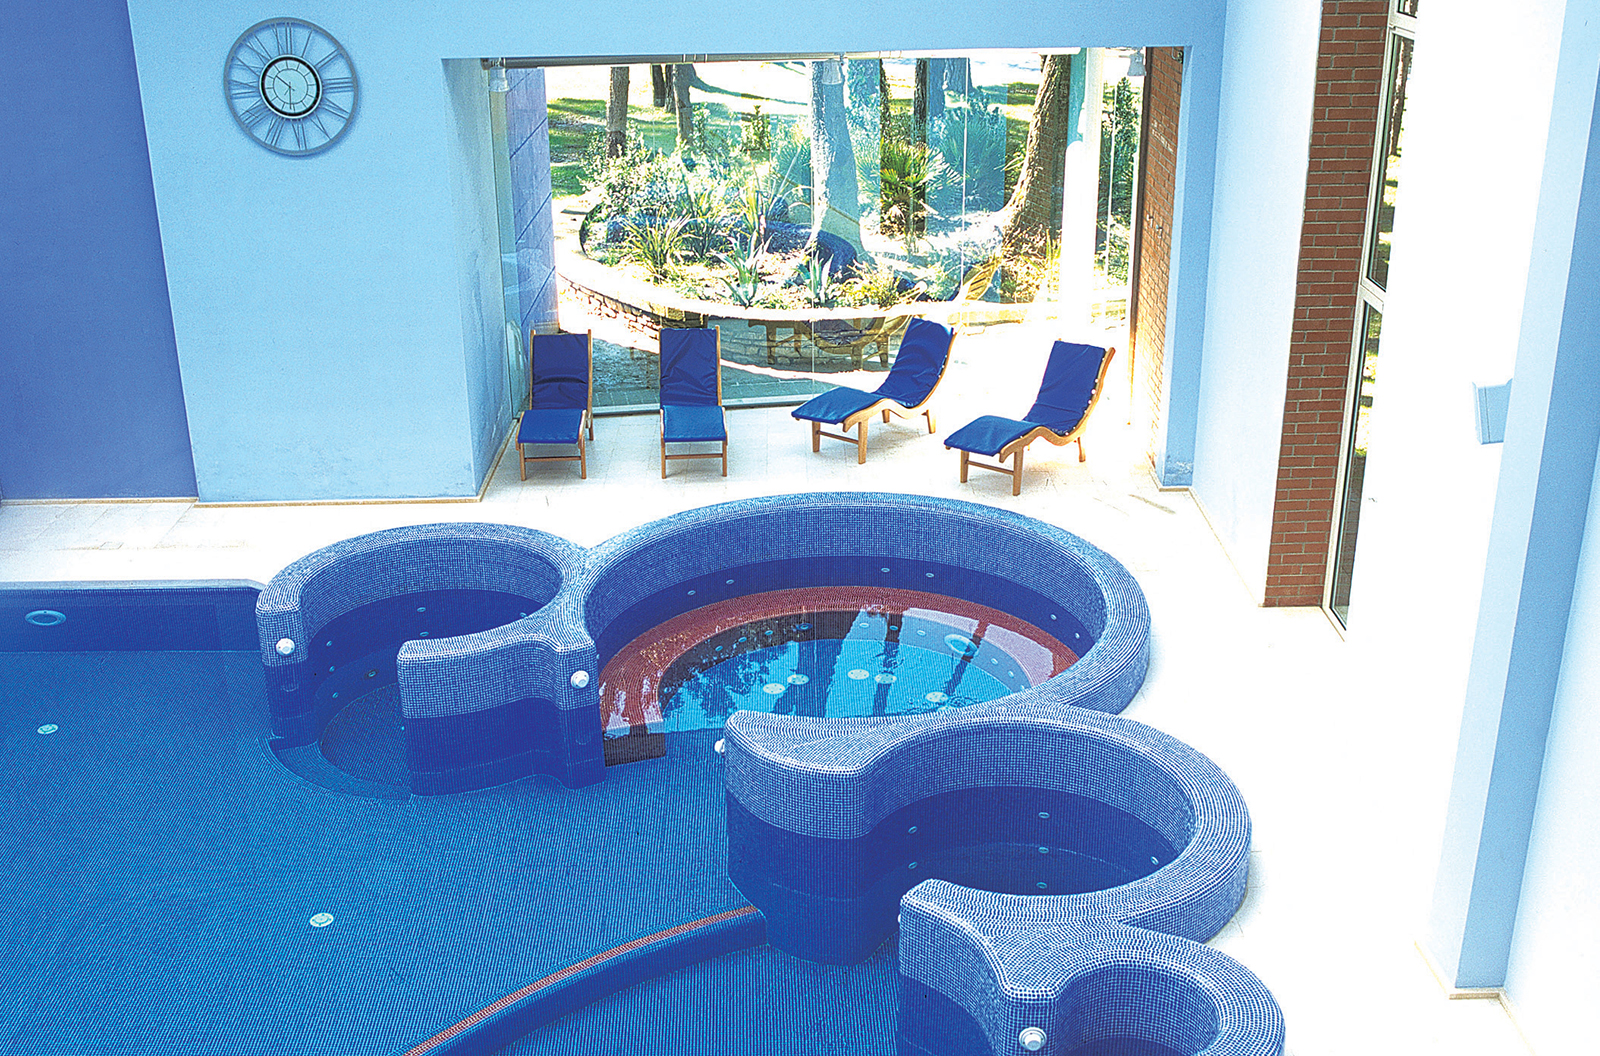 8951264_46_hotel_con_piscina_interna